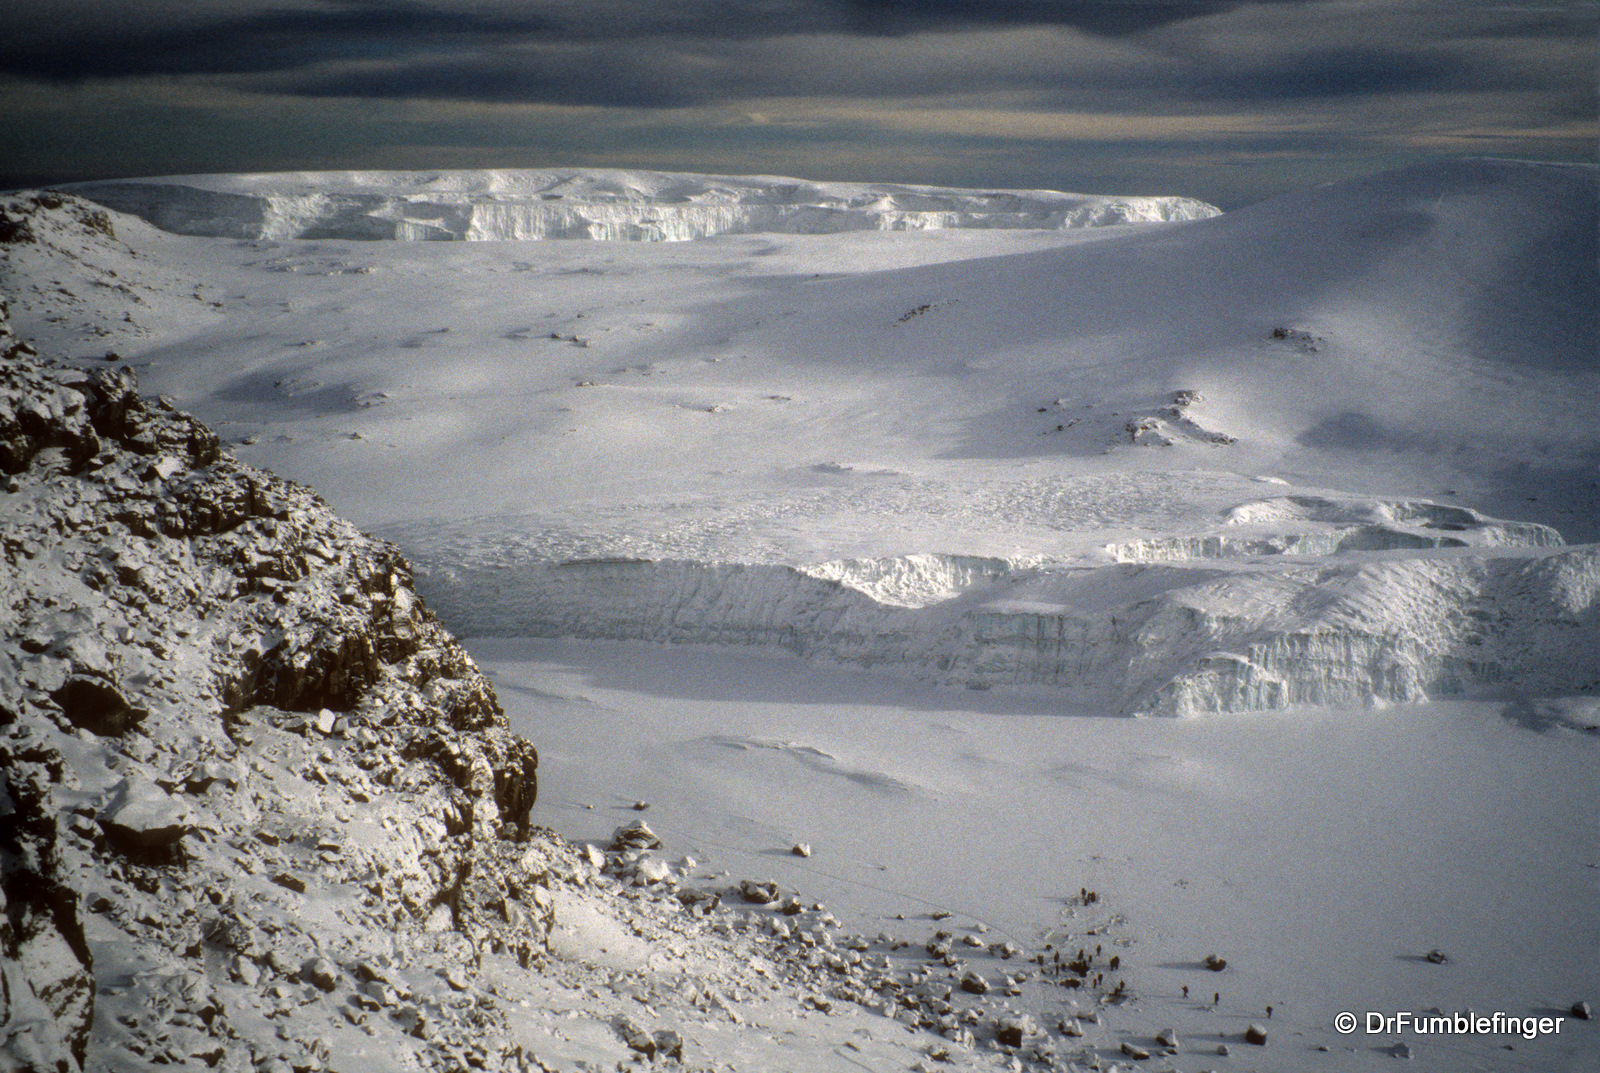 mt-kilimanjaro-summit-003